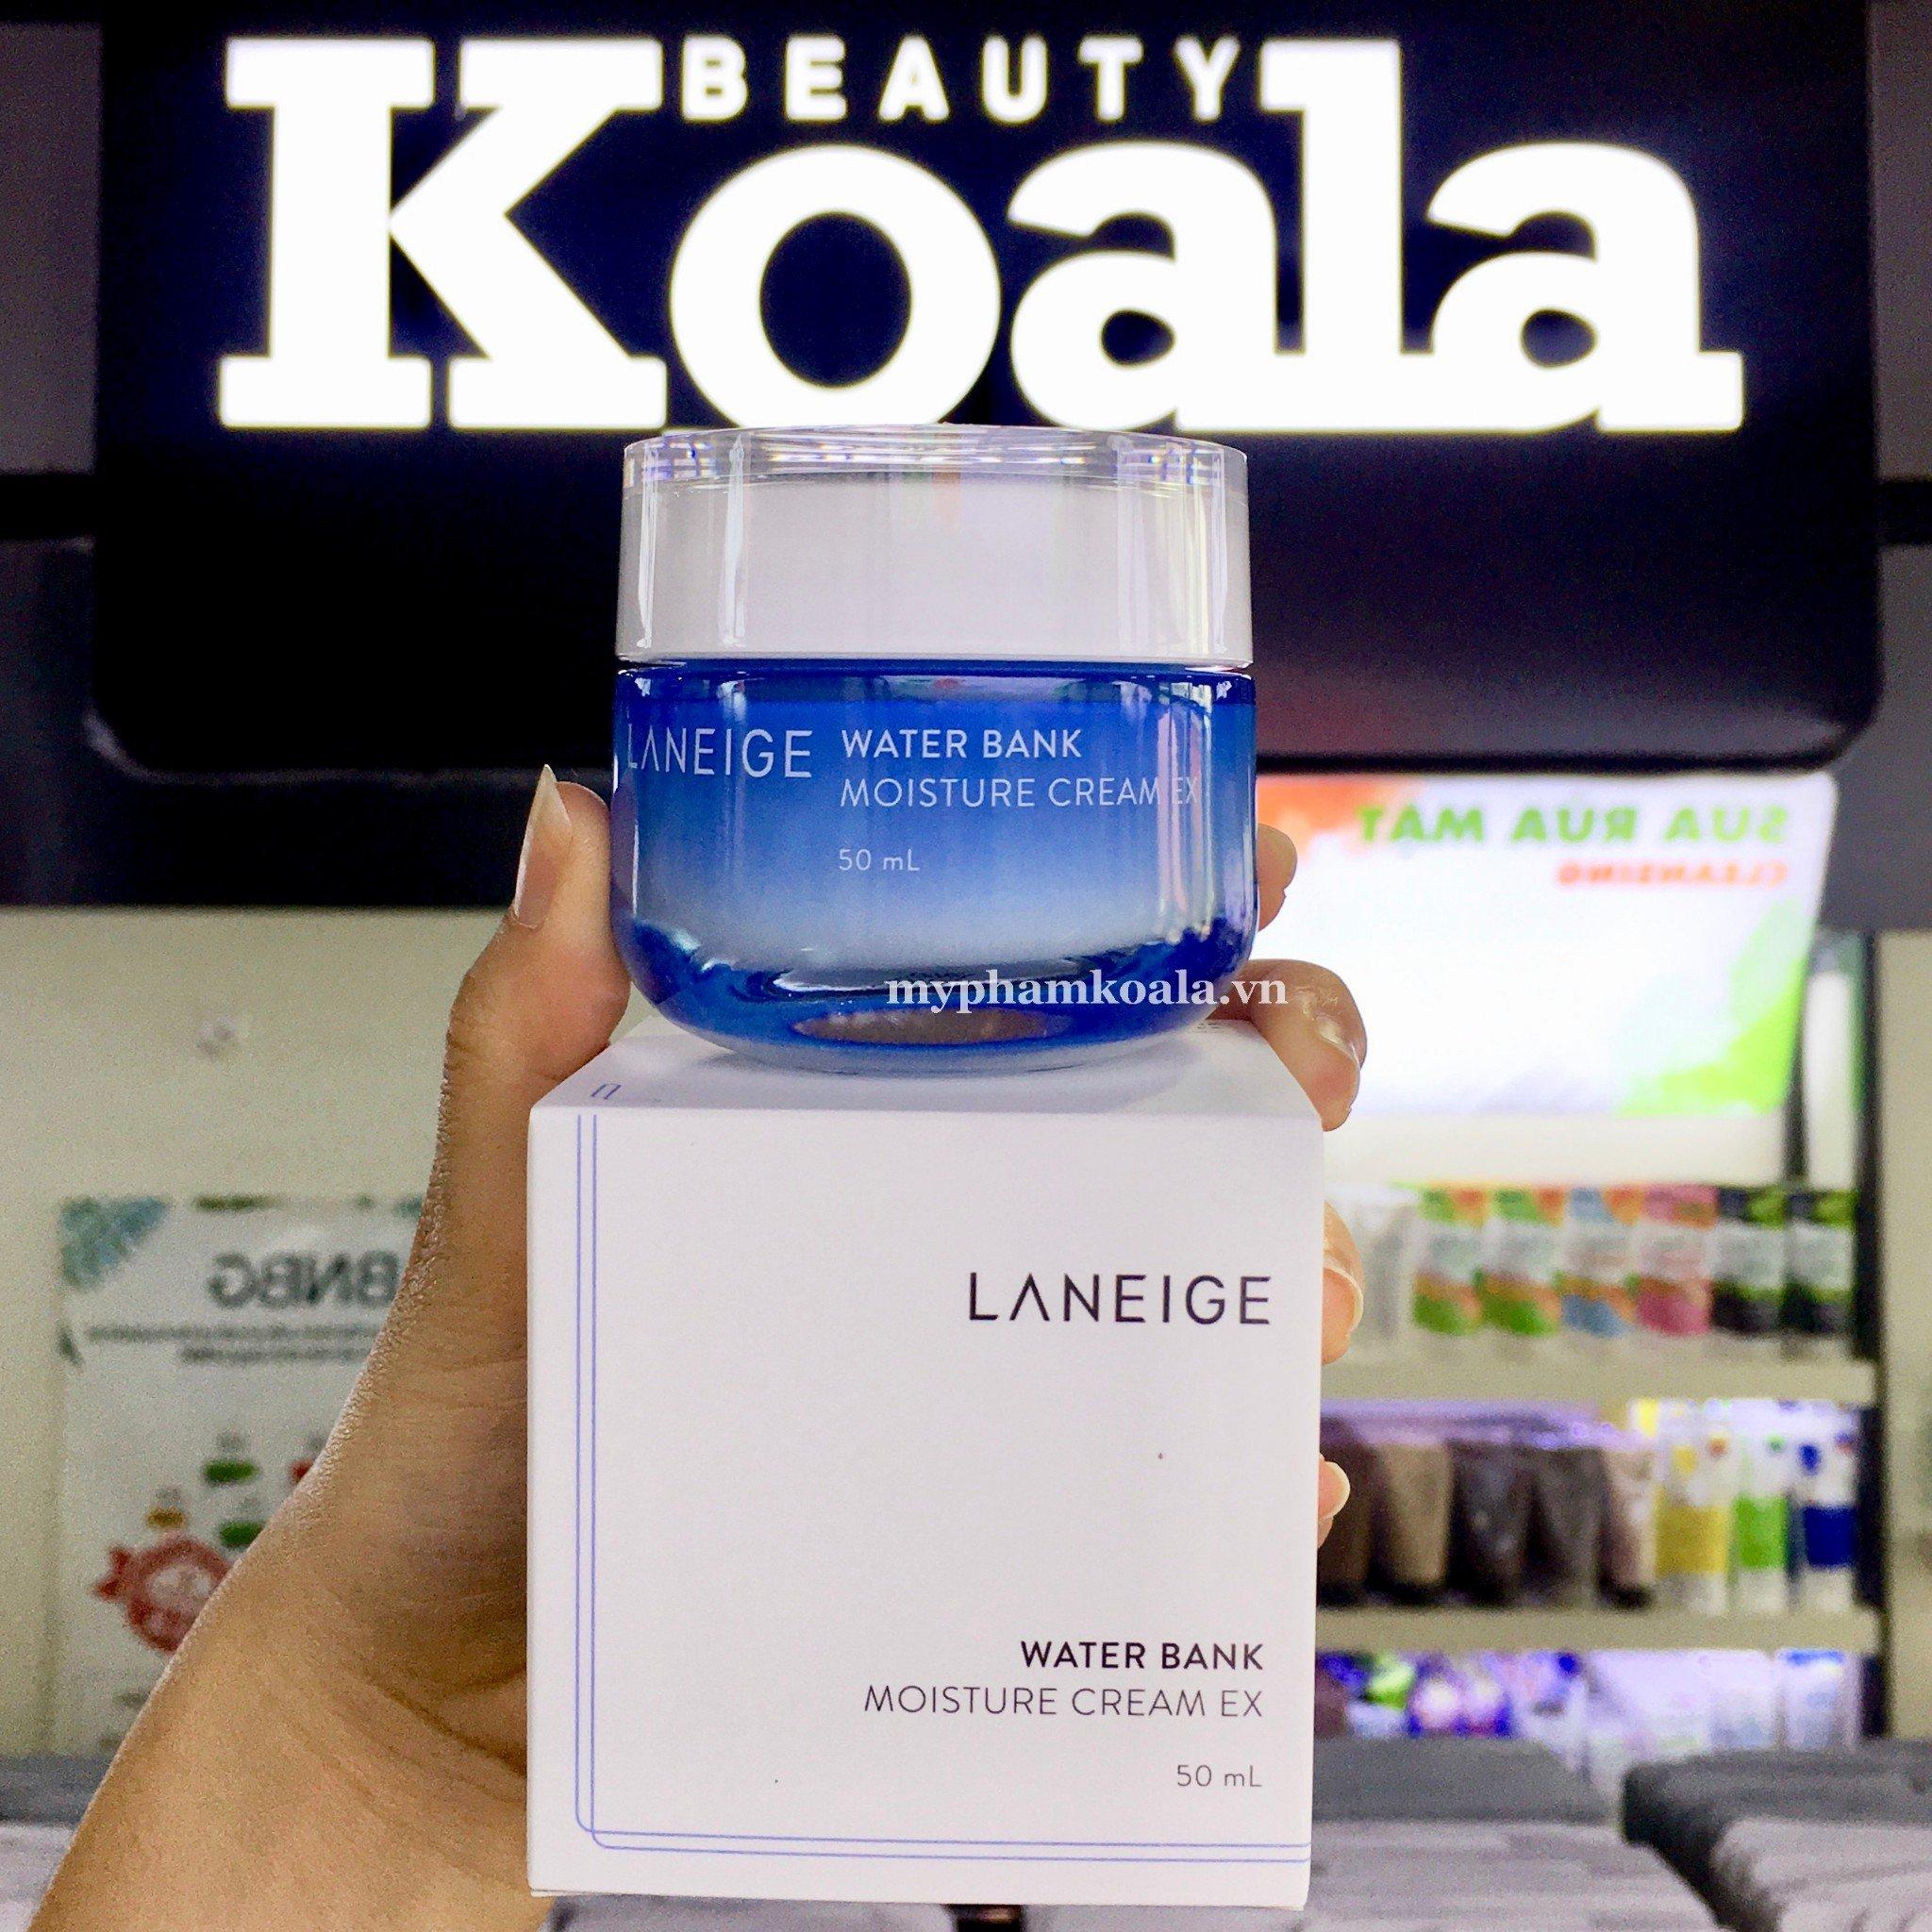 Kem Dưỡng Cấp Nước Laneige Water Bank Moisture Cream EX 50ml